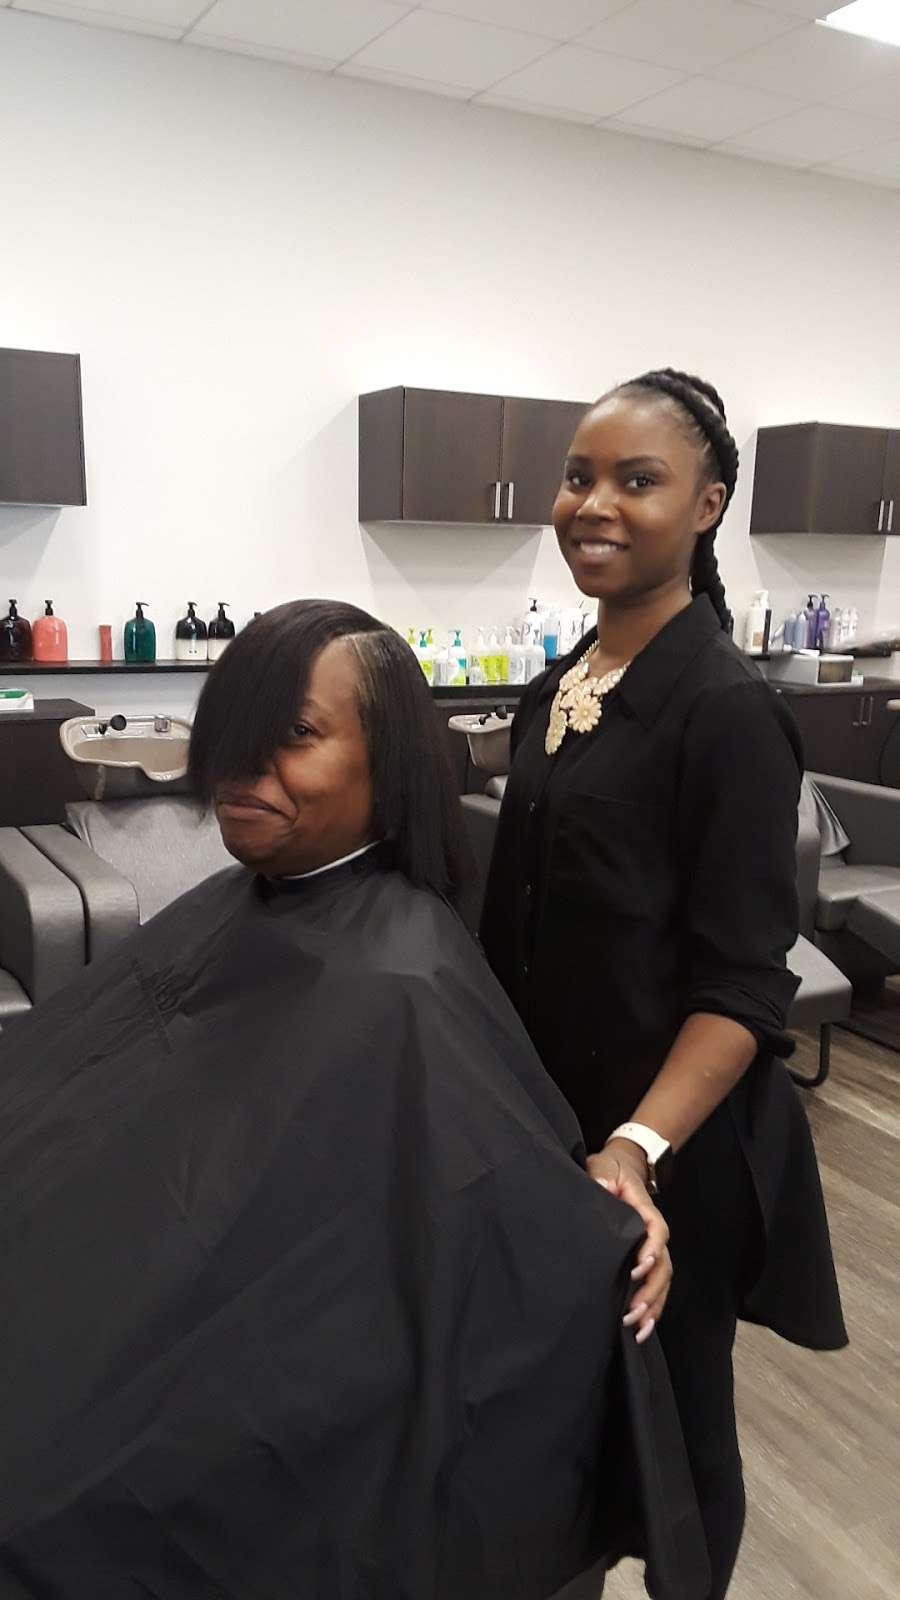 Jovance Salon & Barbering, 9 Pinole Valley Rd, Pinole, CA 9 ...